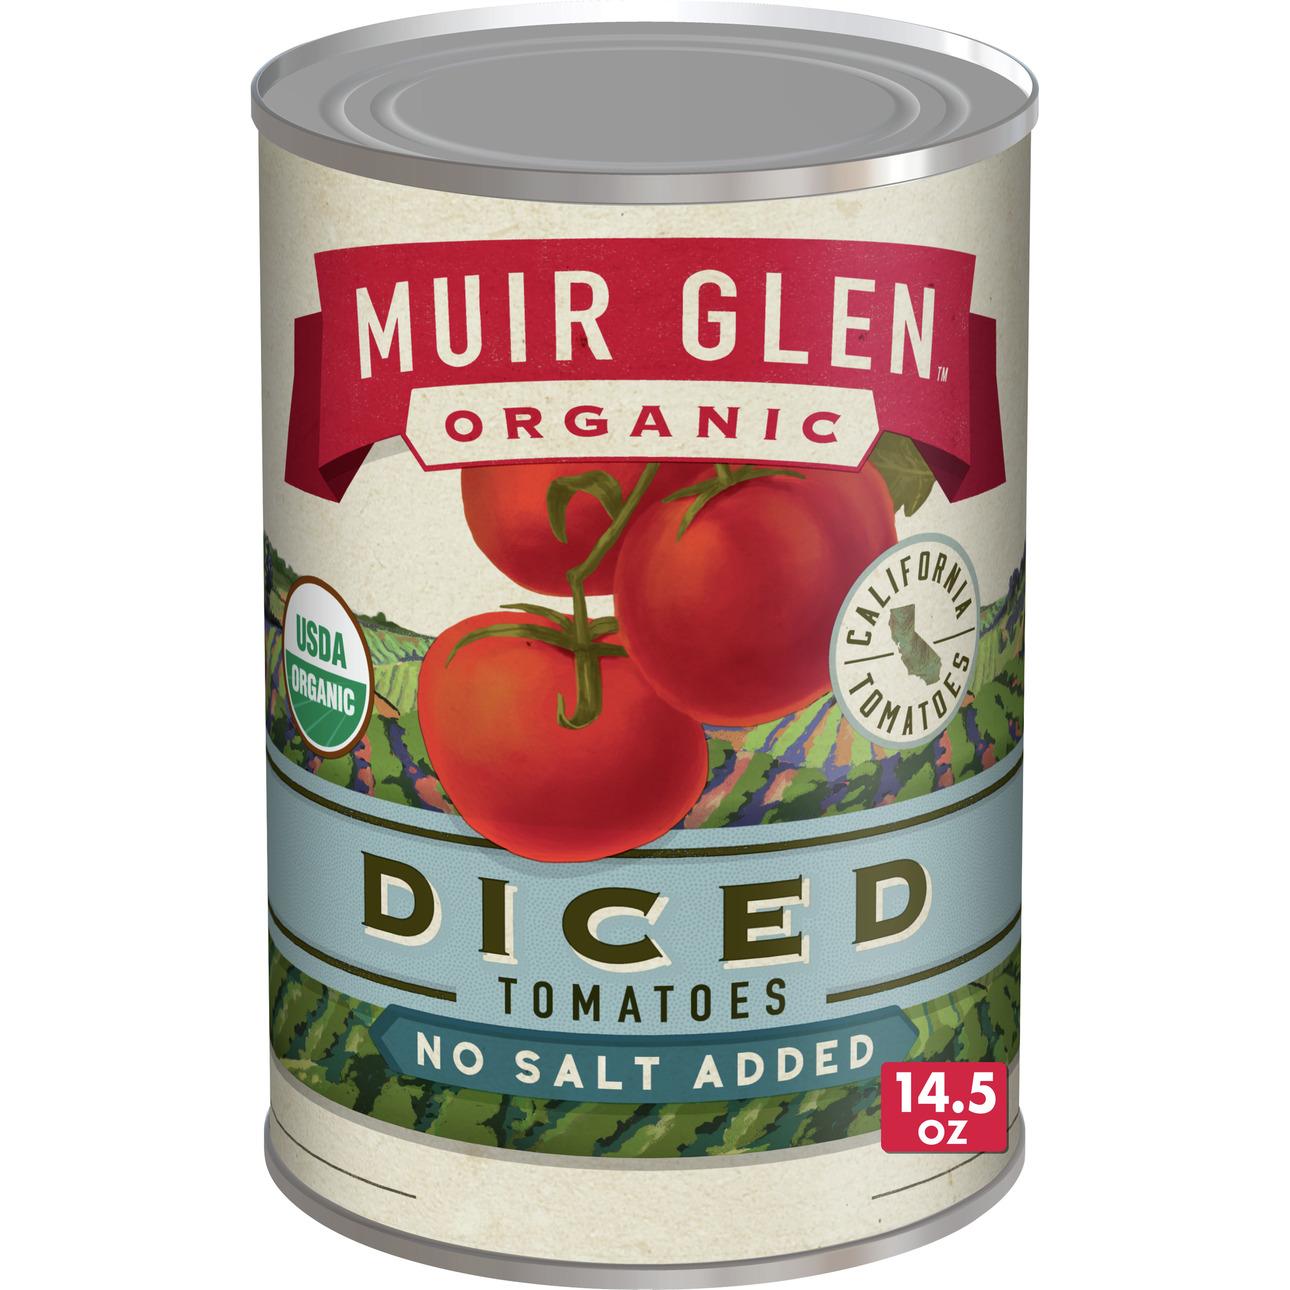 Muir Glen Diced Tomato No Salt (12x145 Oz)